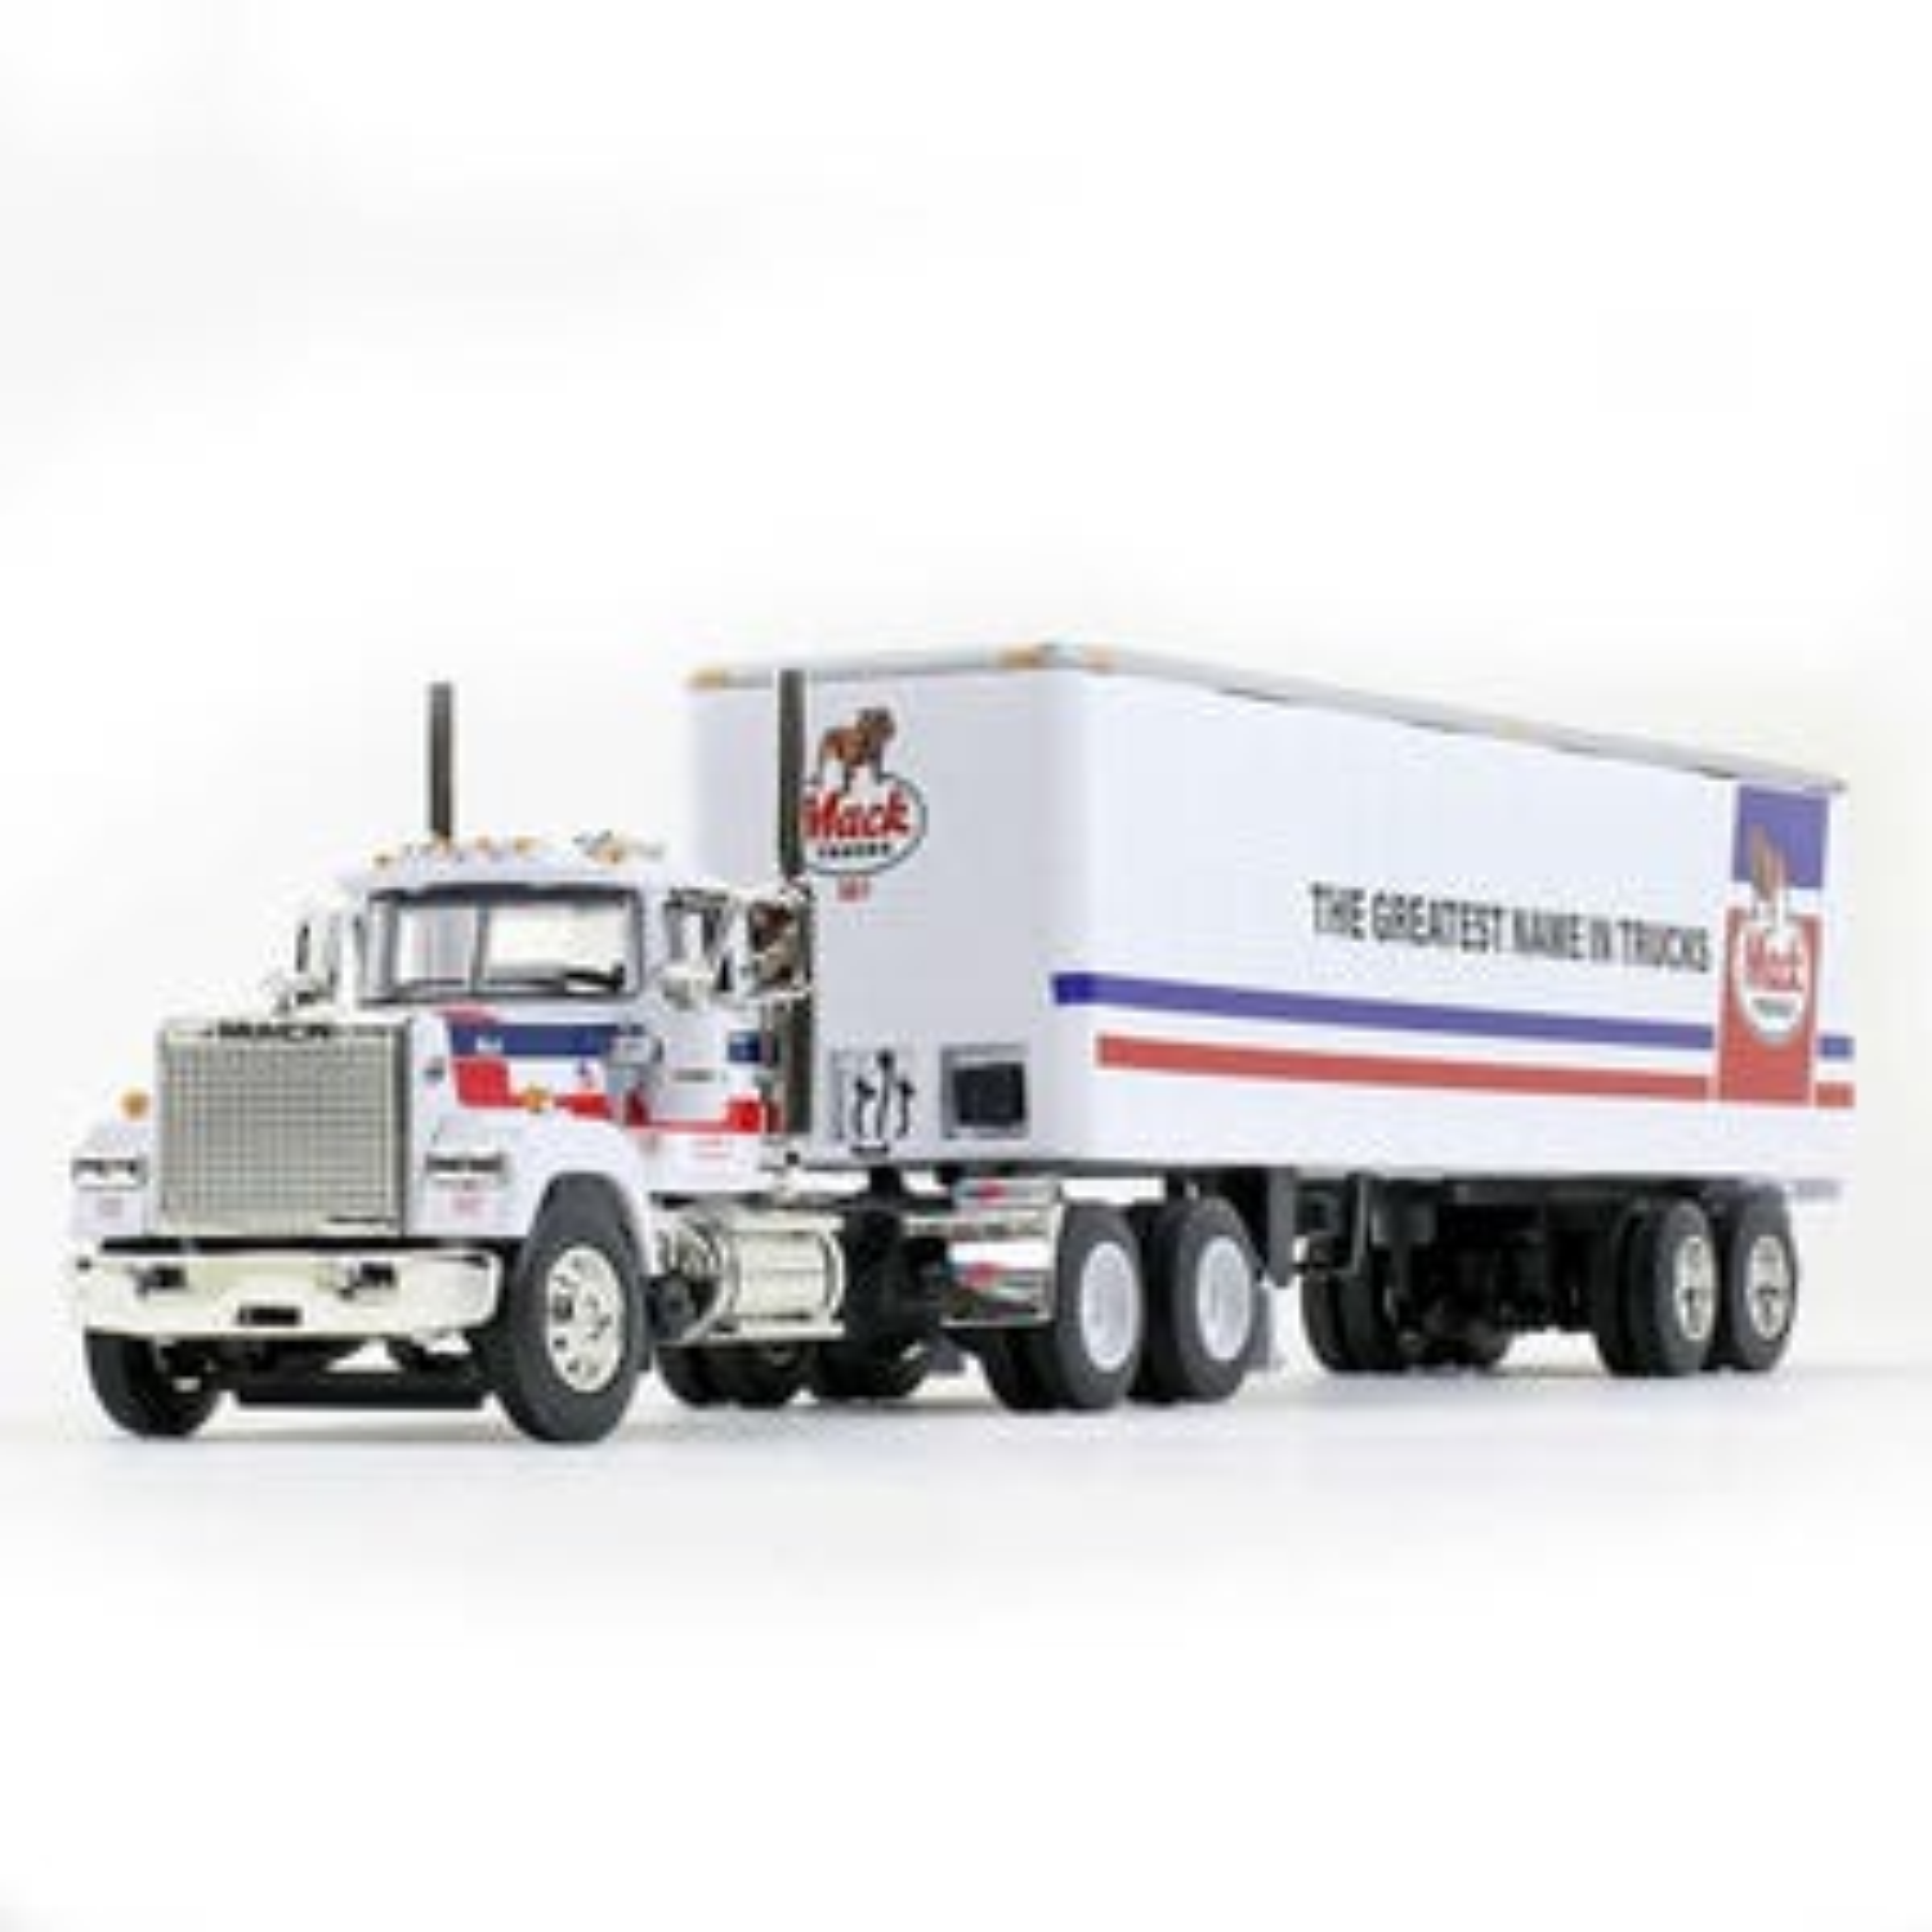 The Greatest Name in Trucks